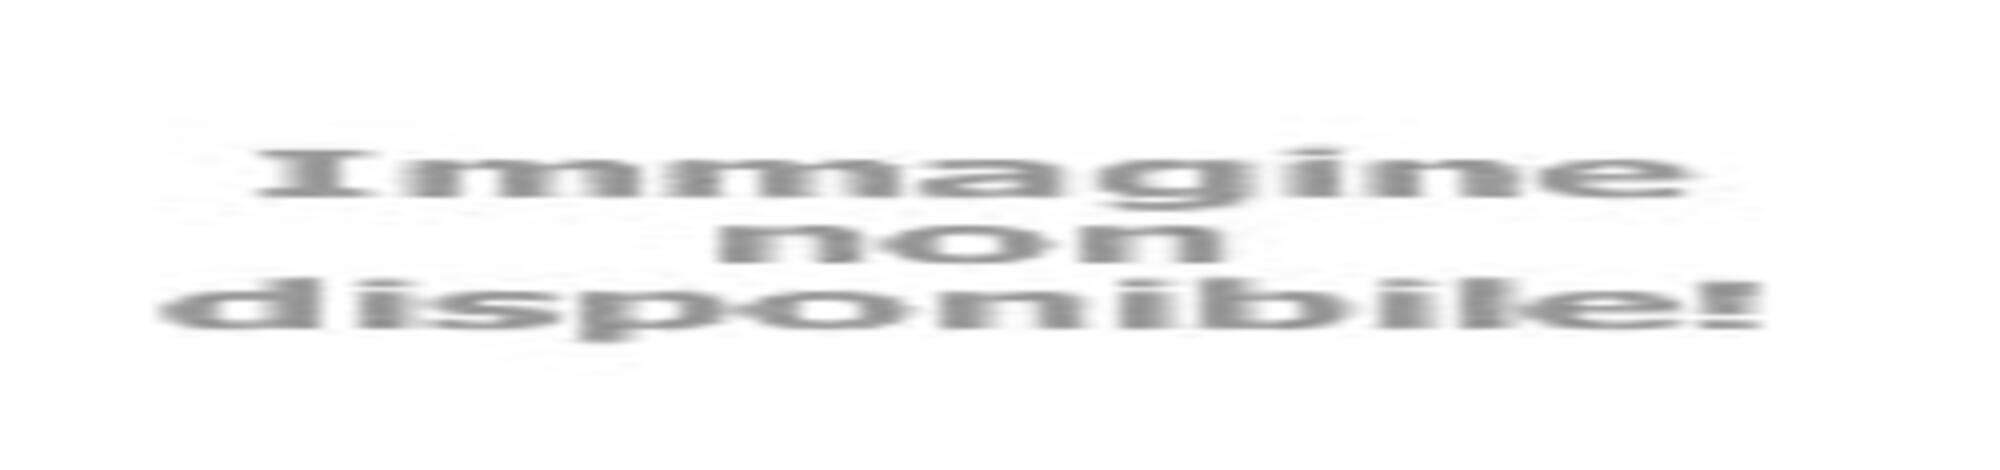 Offerte Gluten Free Expo Rimini Fiera